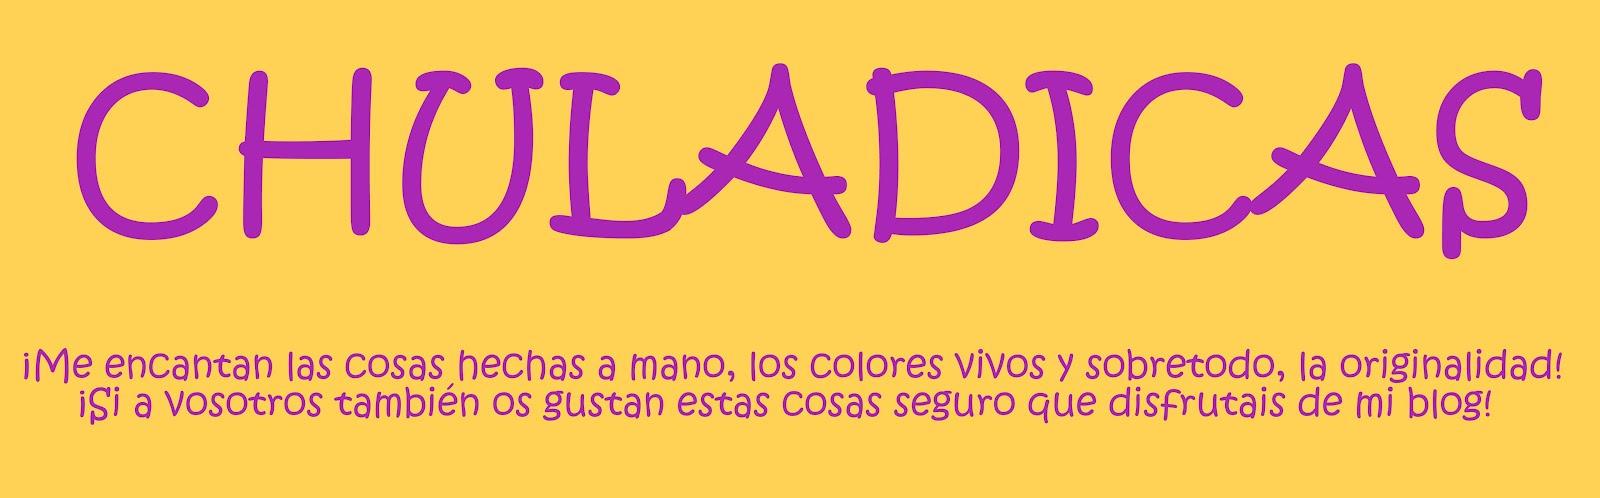 CHULADICAS